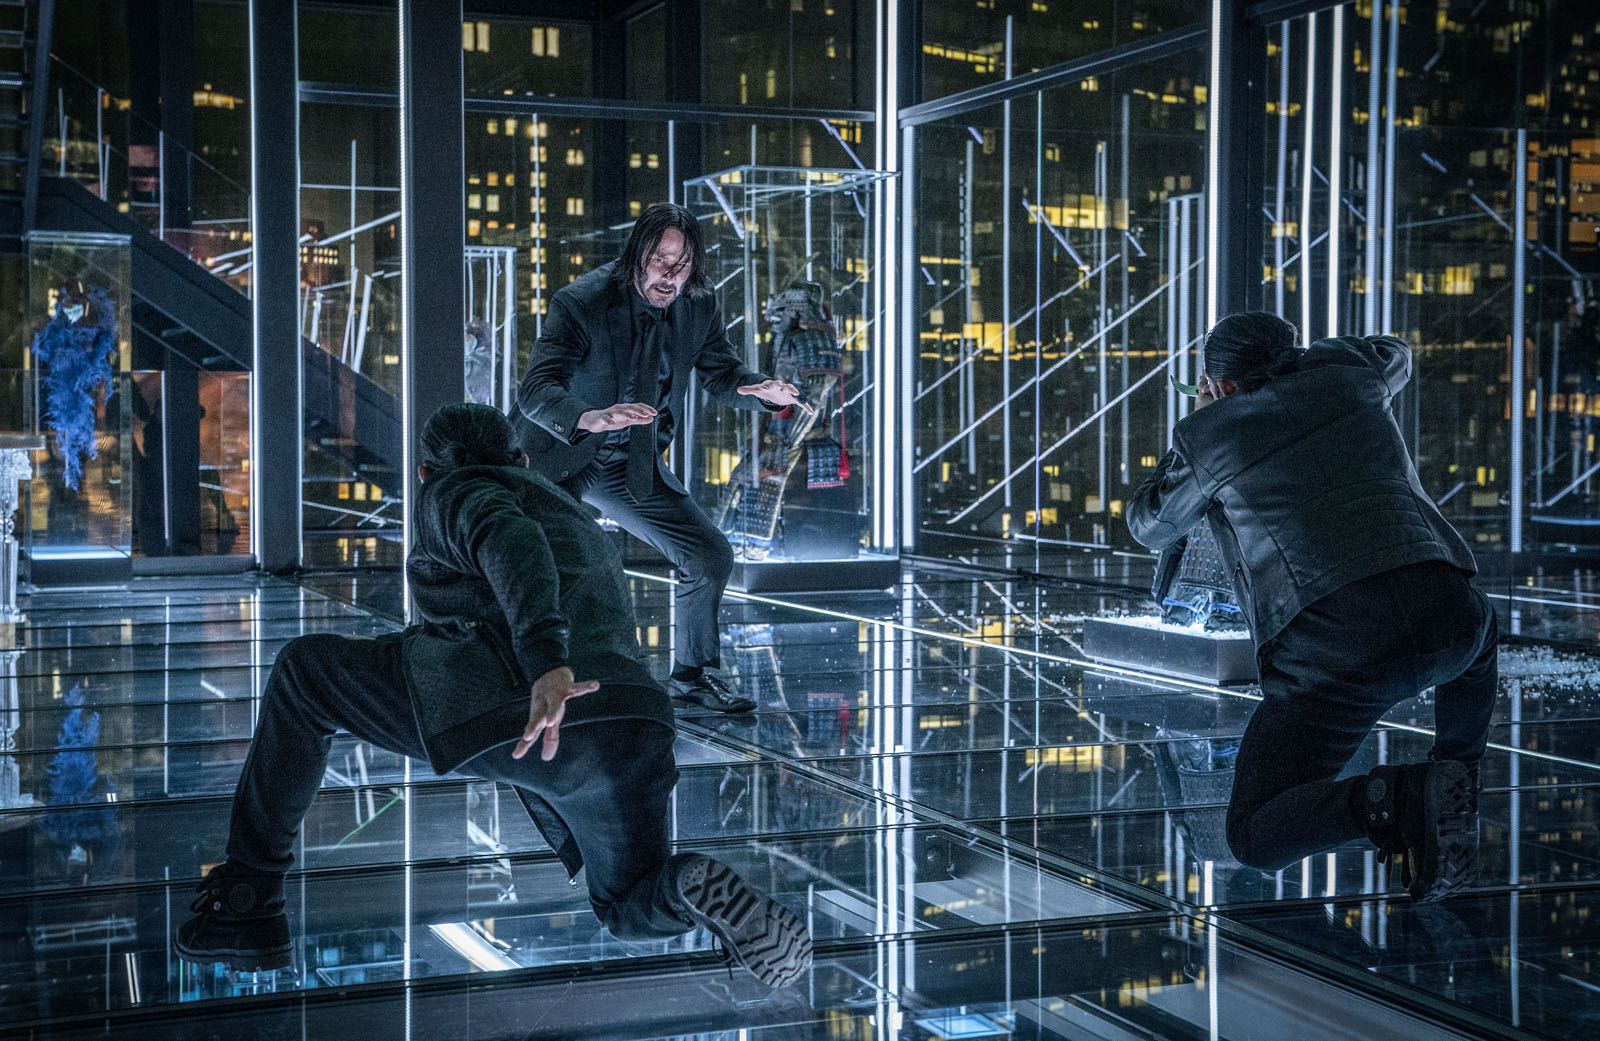 Keanu Reeves reviendra botter des culs en 2021 dans John Wick 4